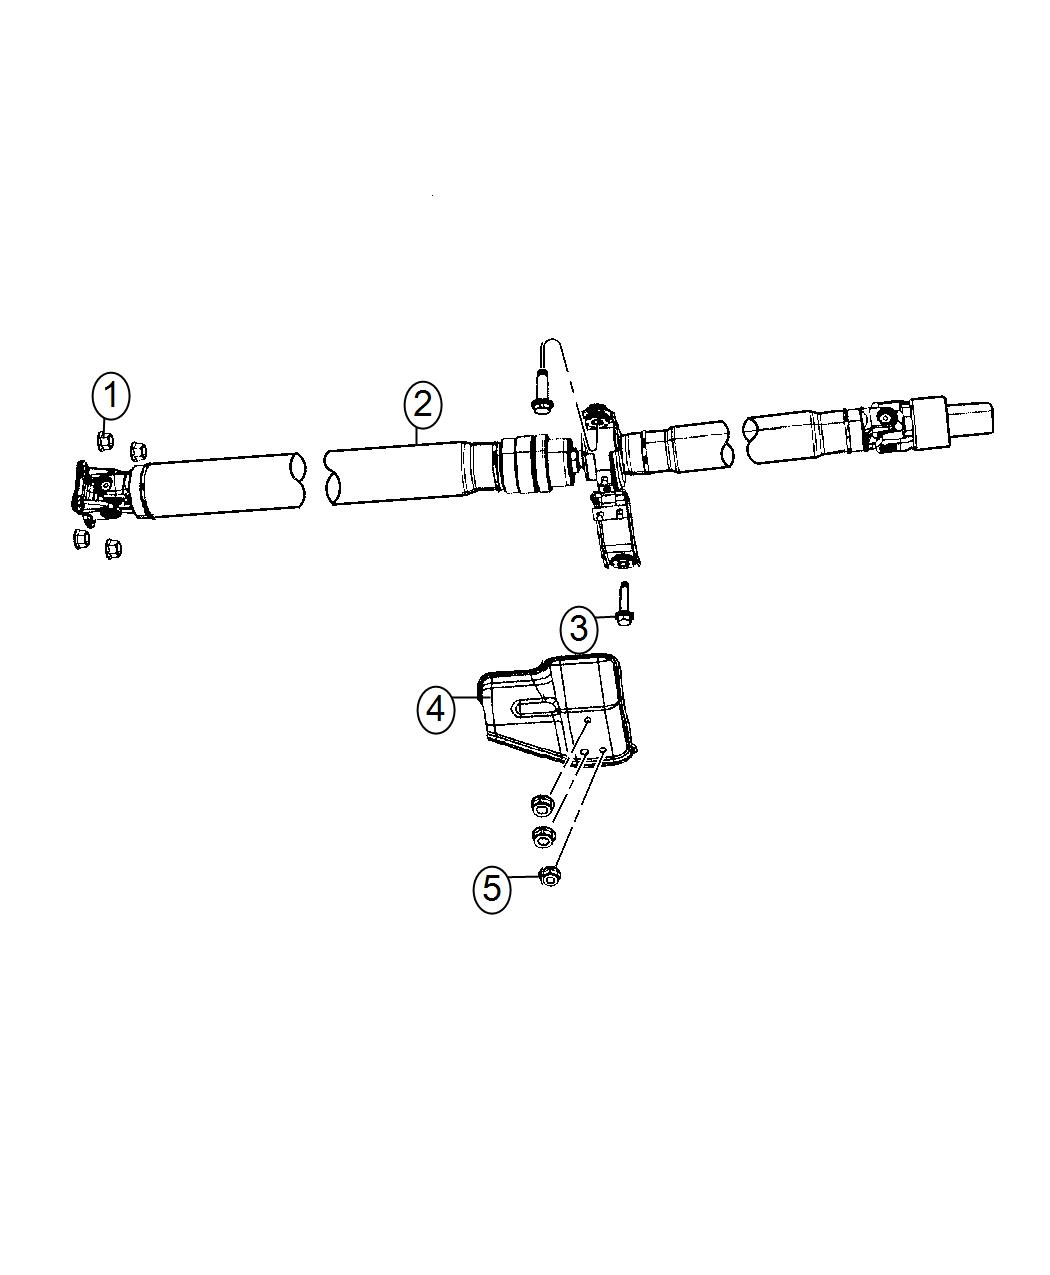 2017 Jeep Compass Shaft  Drive  Rear